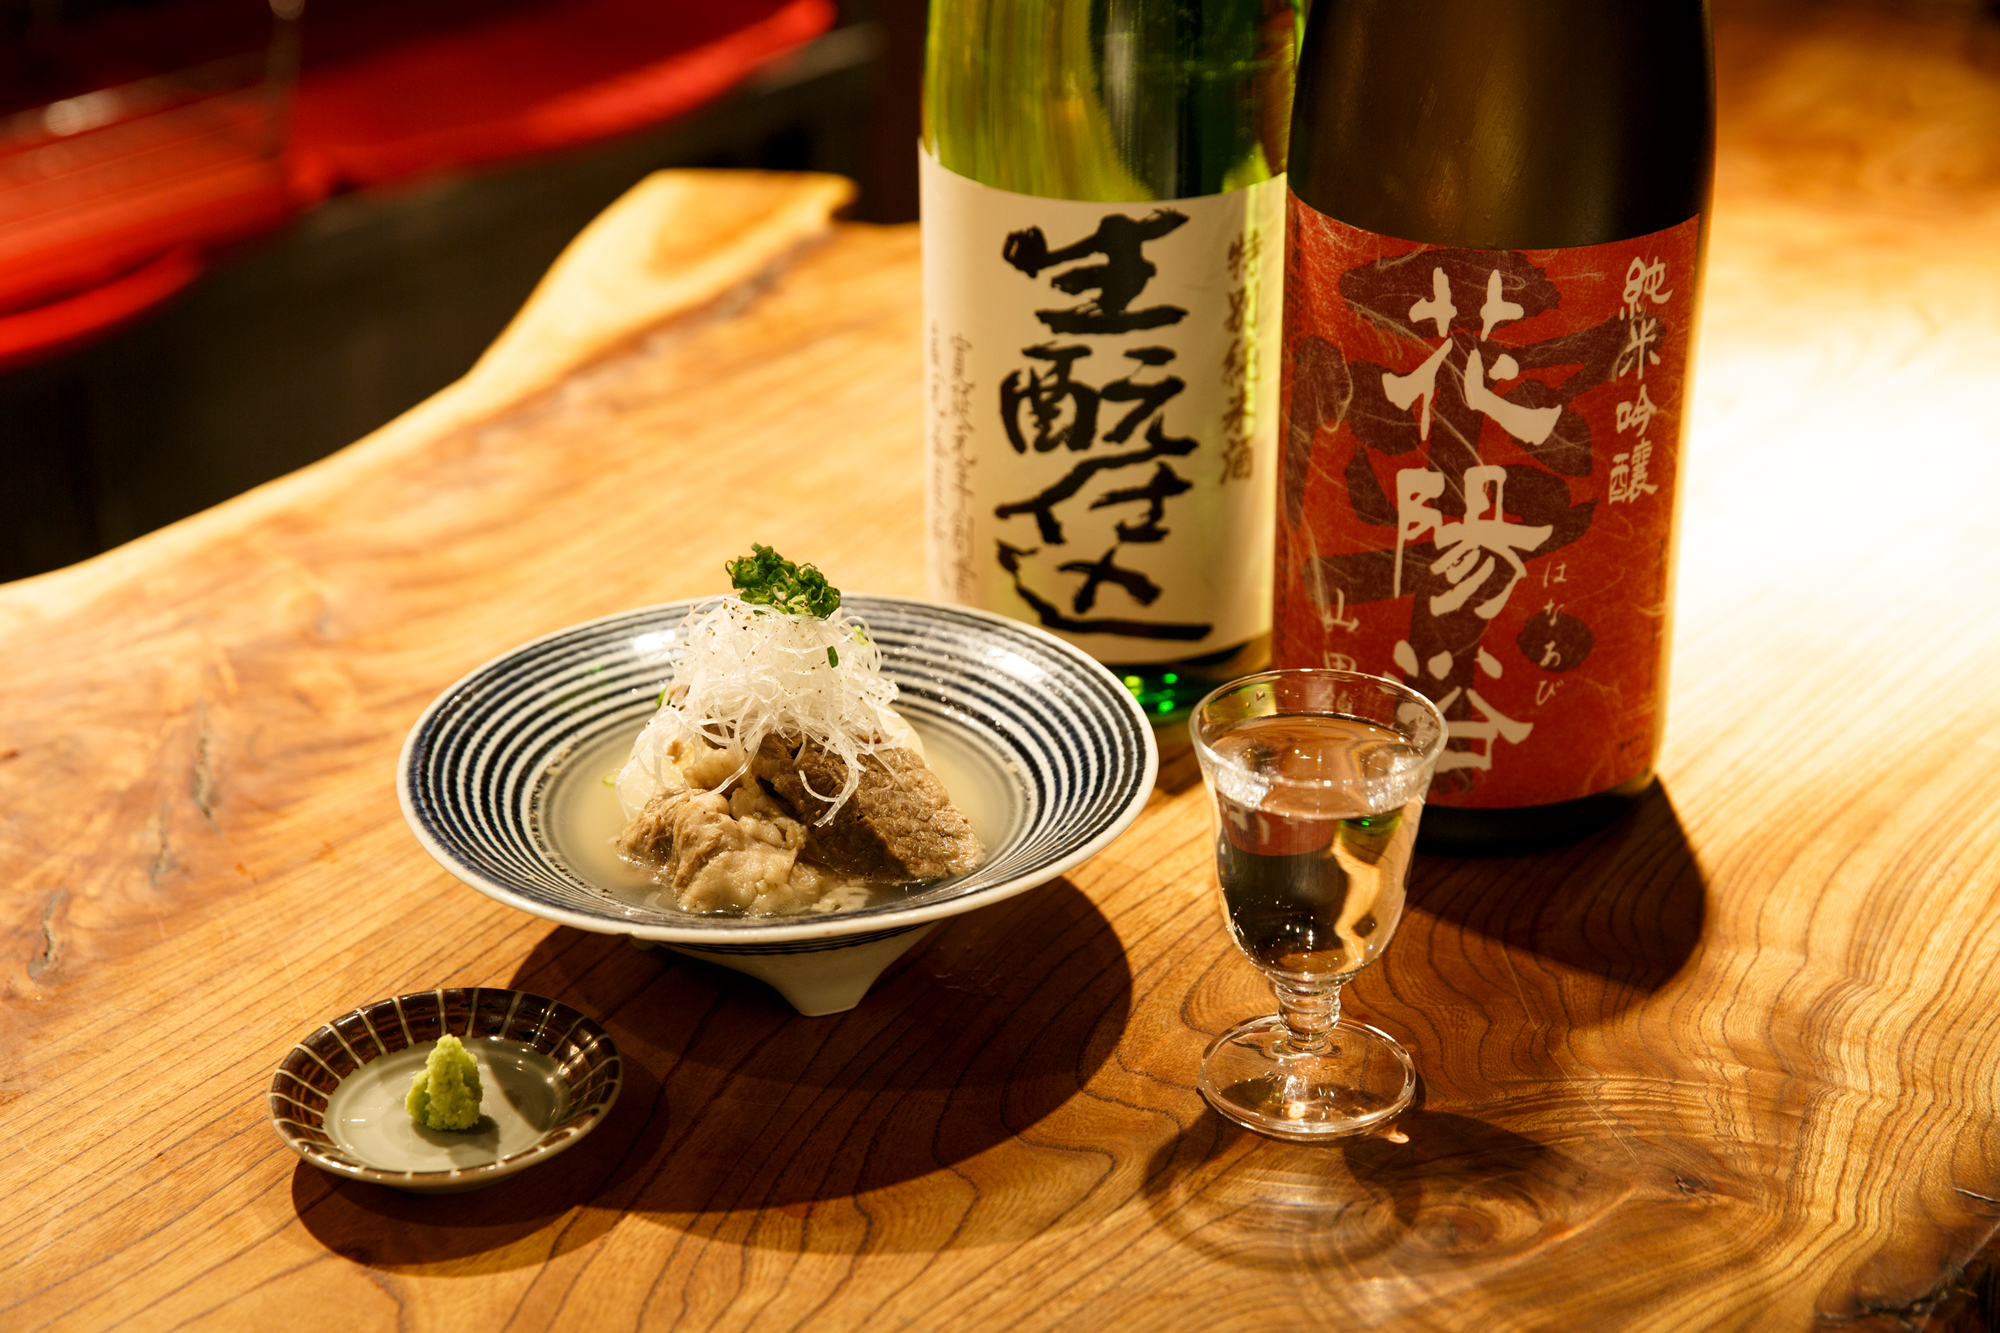 Sakaya no Tonari